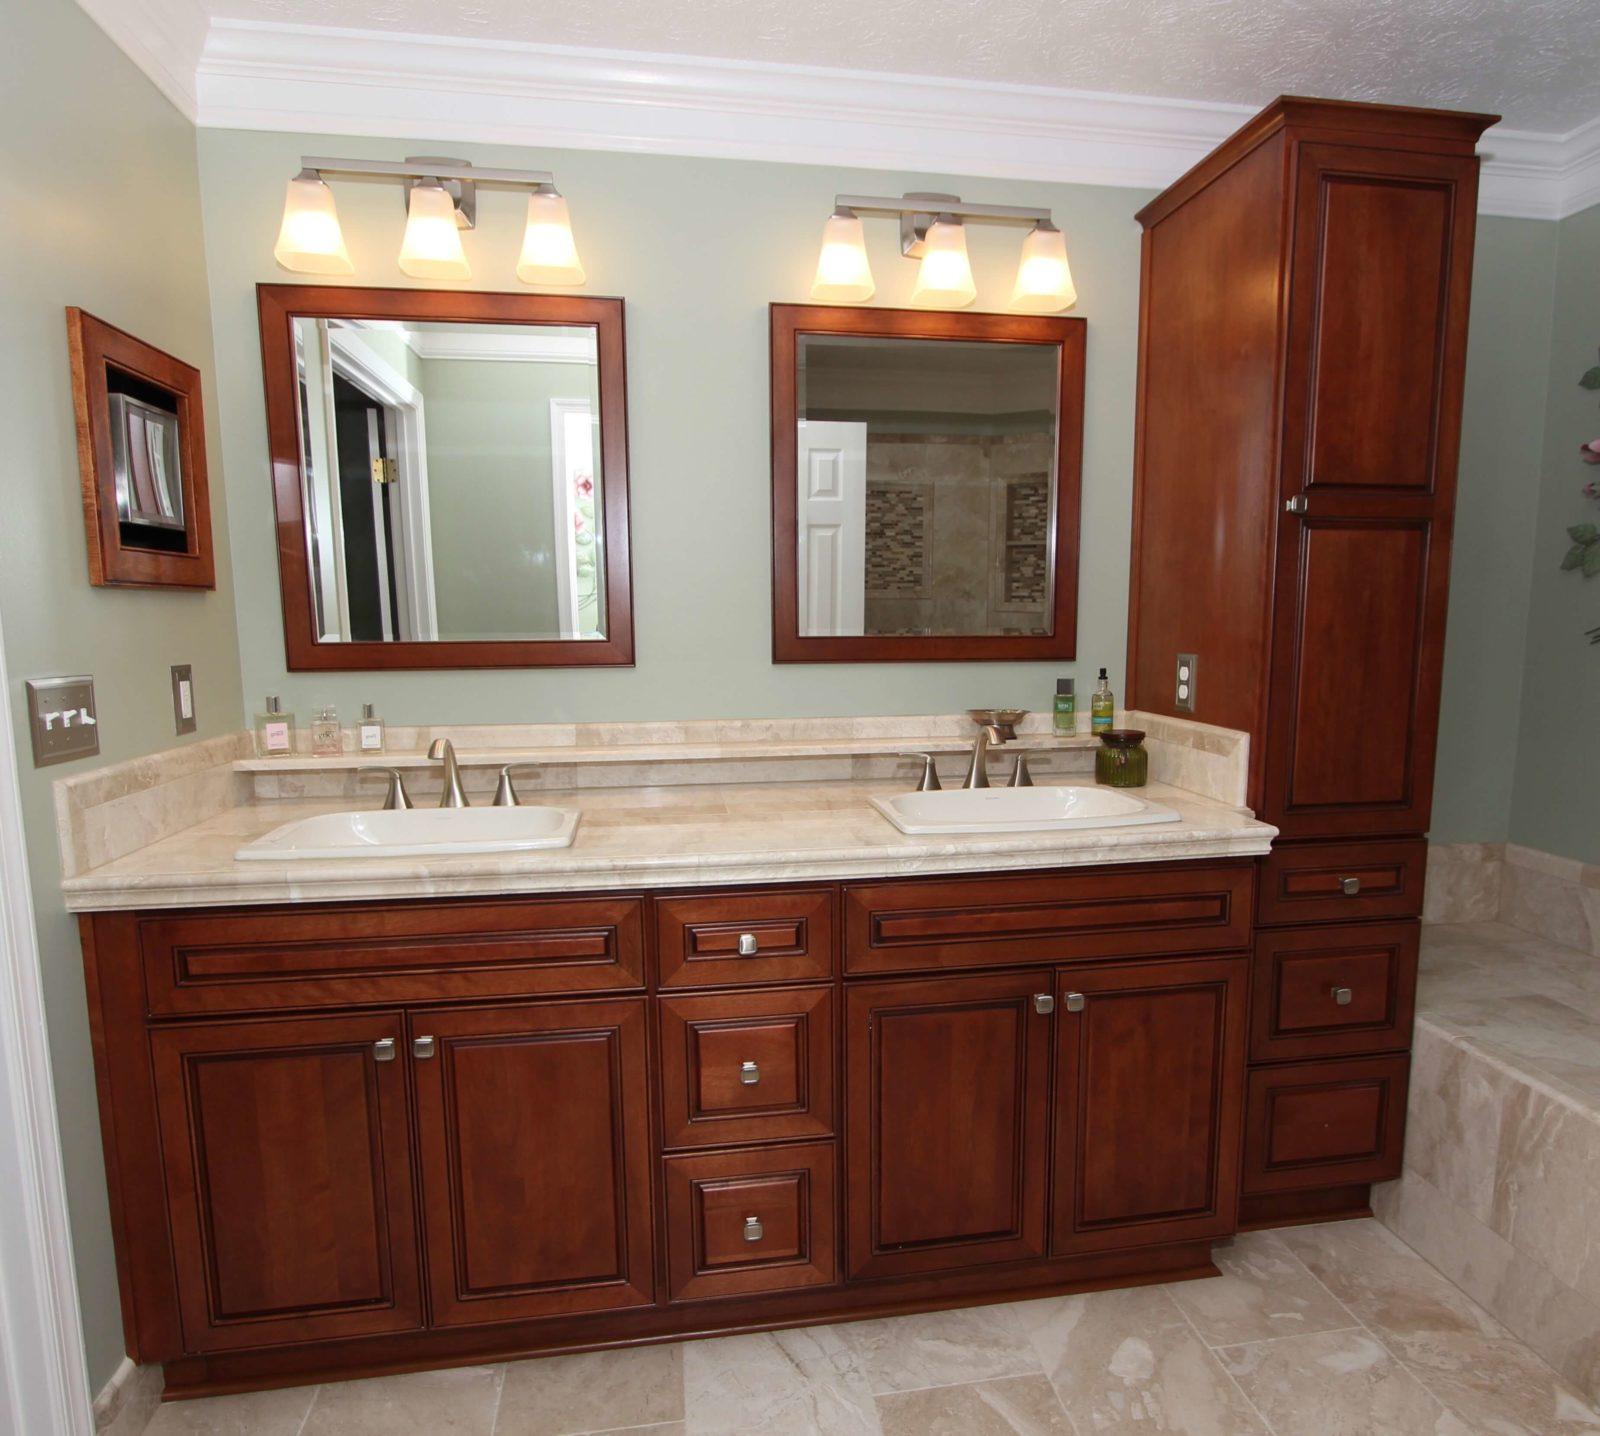 traditional double vanity